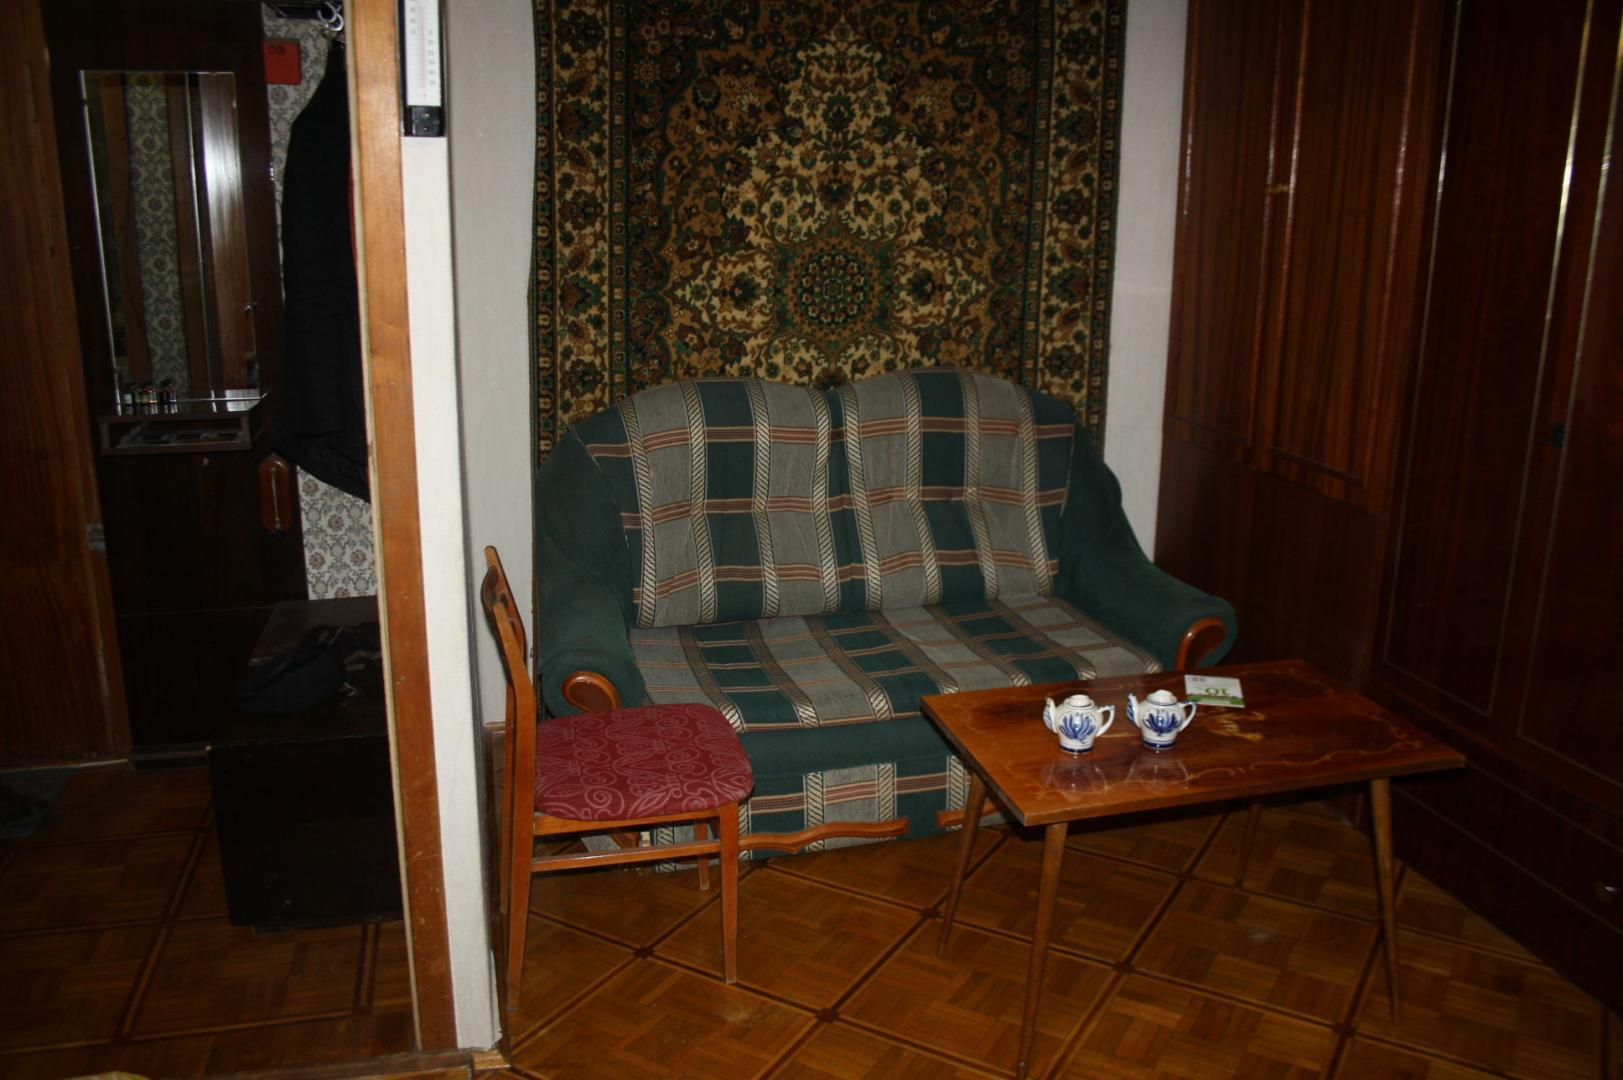 Квартира, 1 комната, 35 м² в Люберцах 89160792833 купить 2